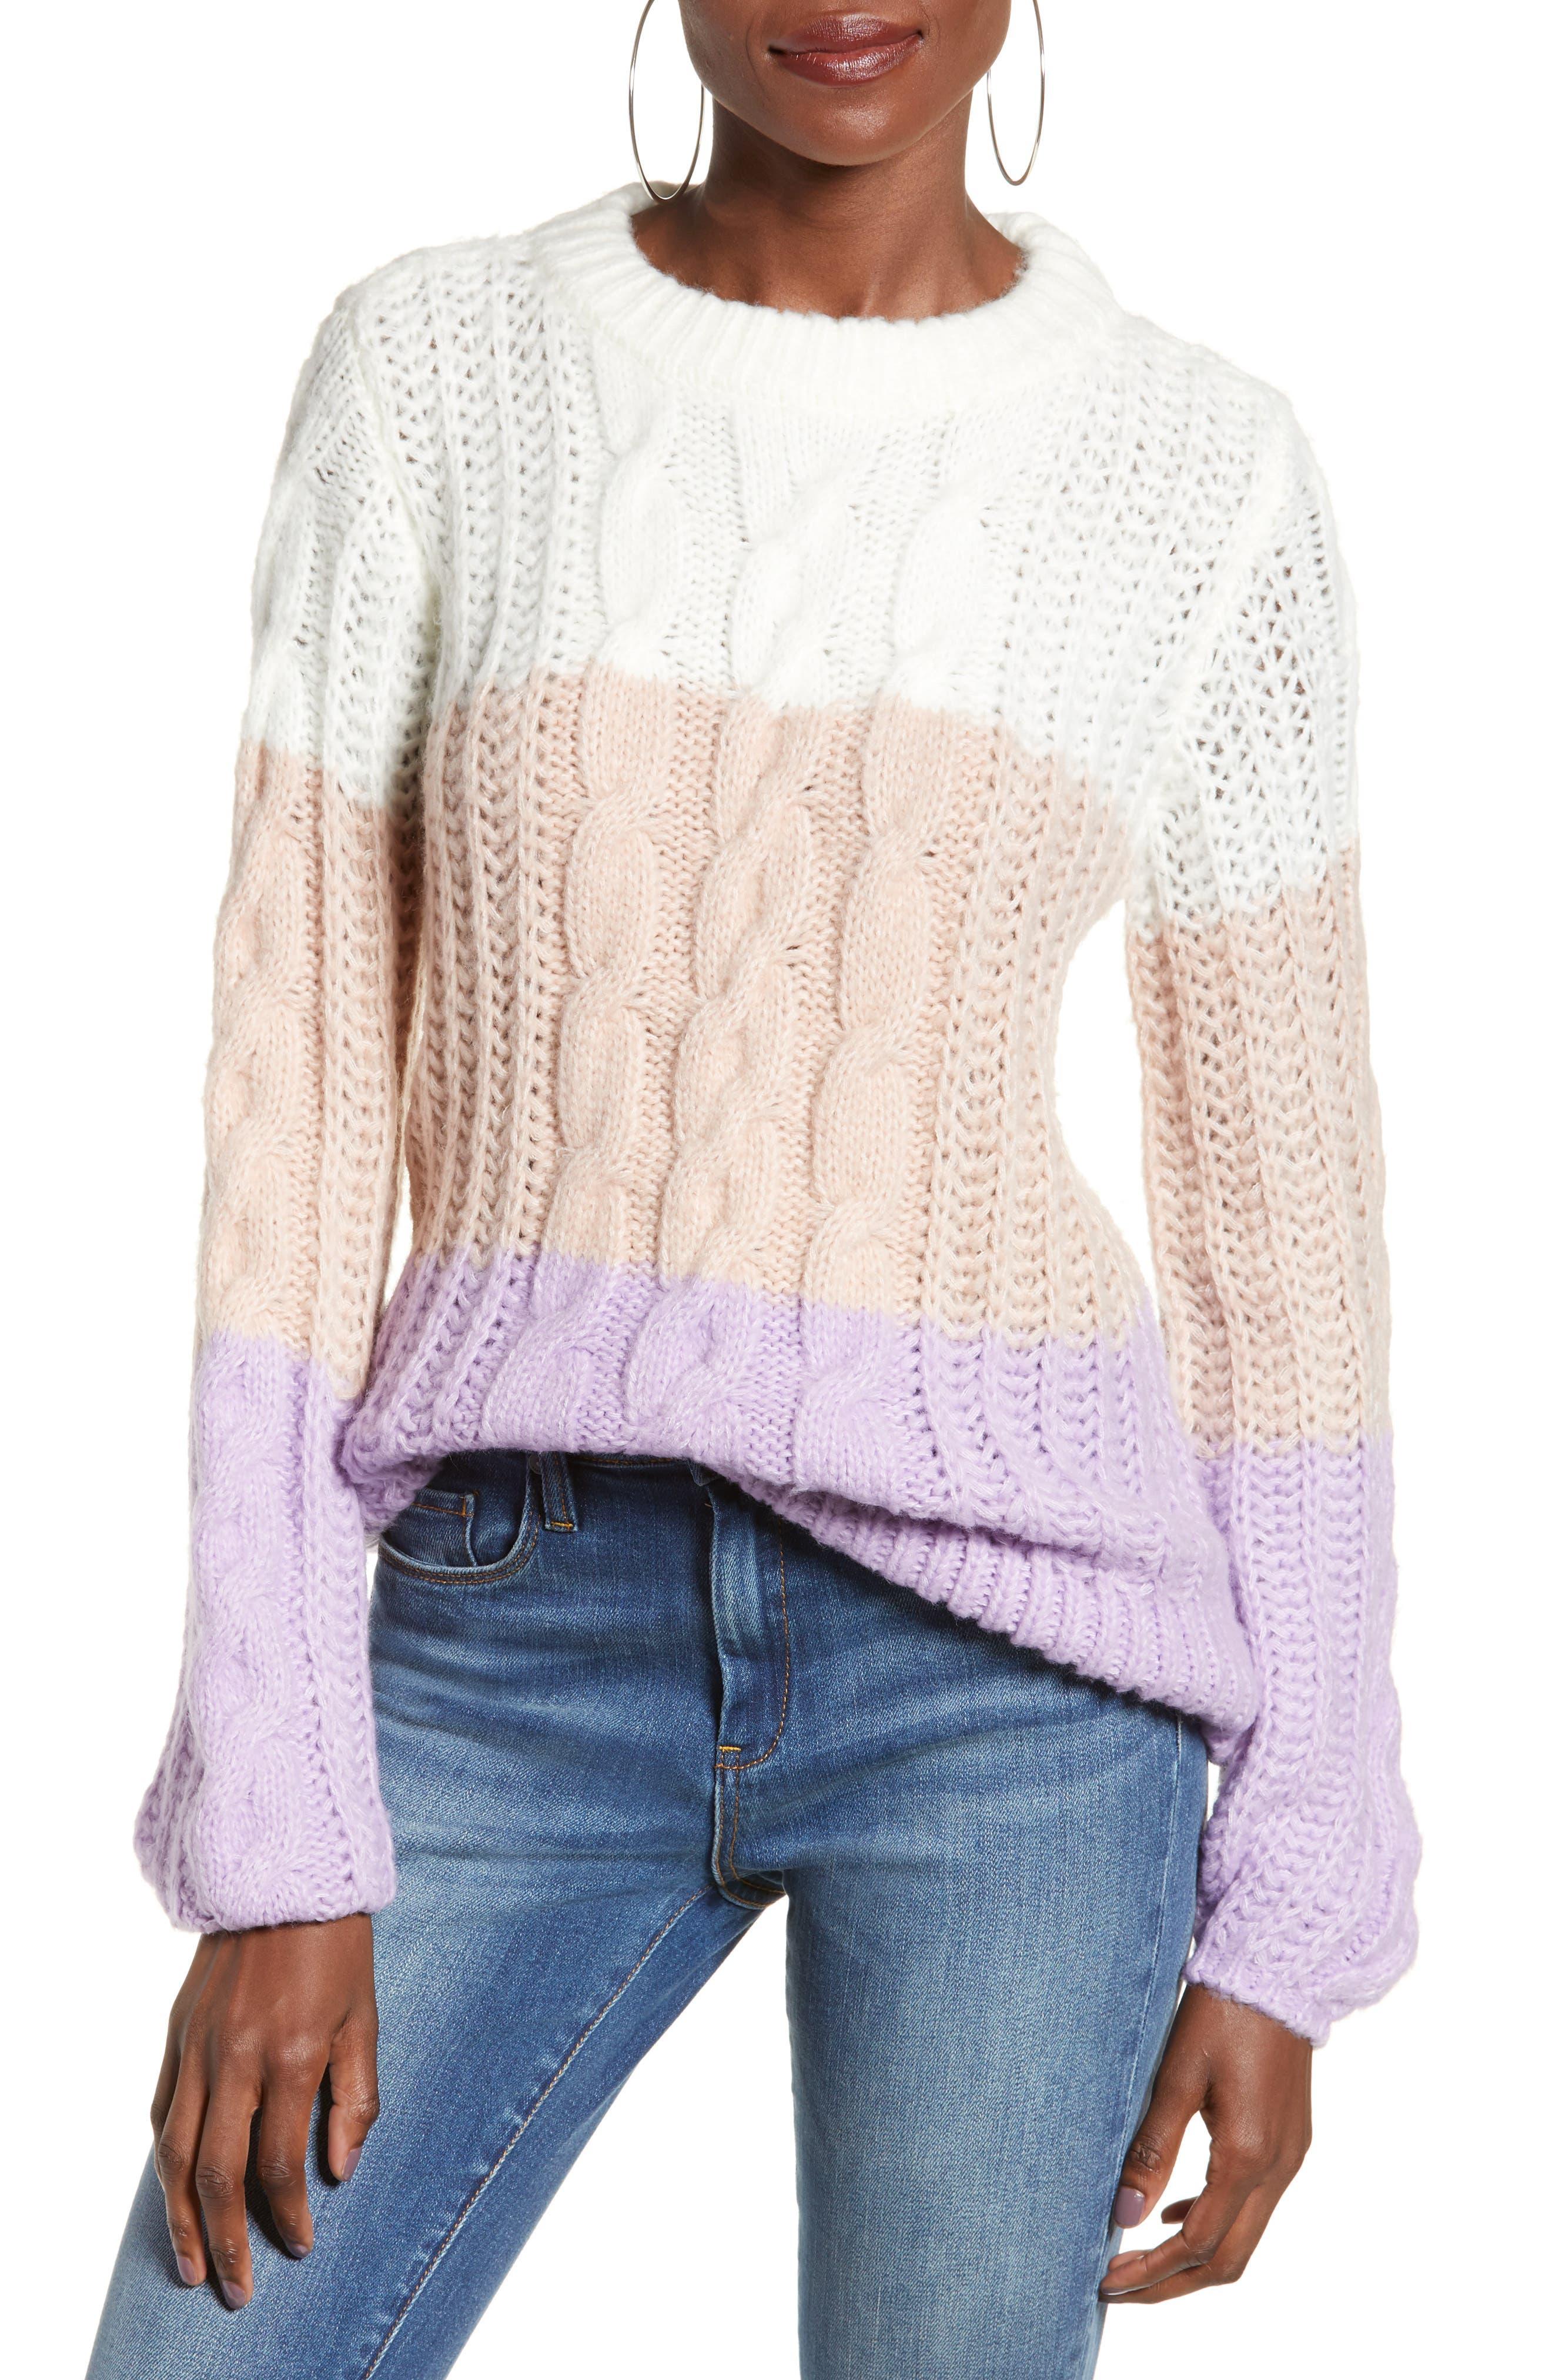 Vero Moda Becca Colorblock Chunky Cable Sweater, Pink